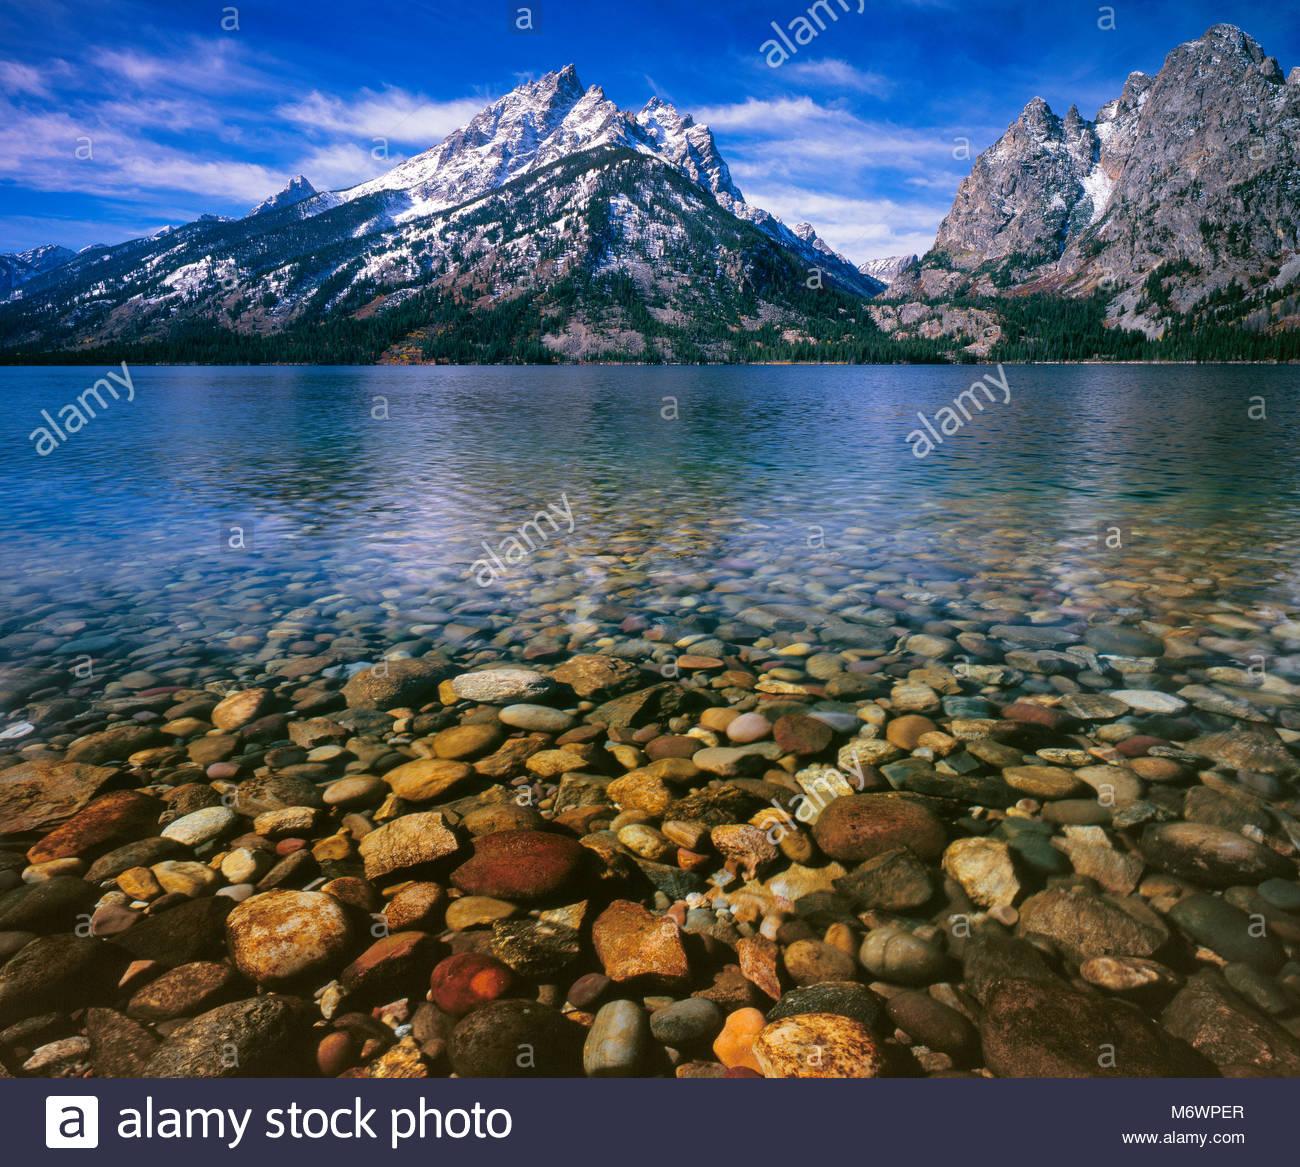 Jenny Lake, Cascade Canyon, Mount Teewinot, Grand Teton National Park, Wyoming Stock Photo